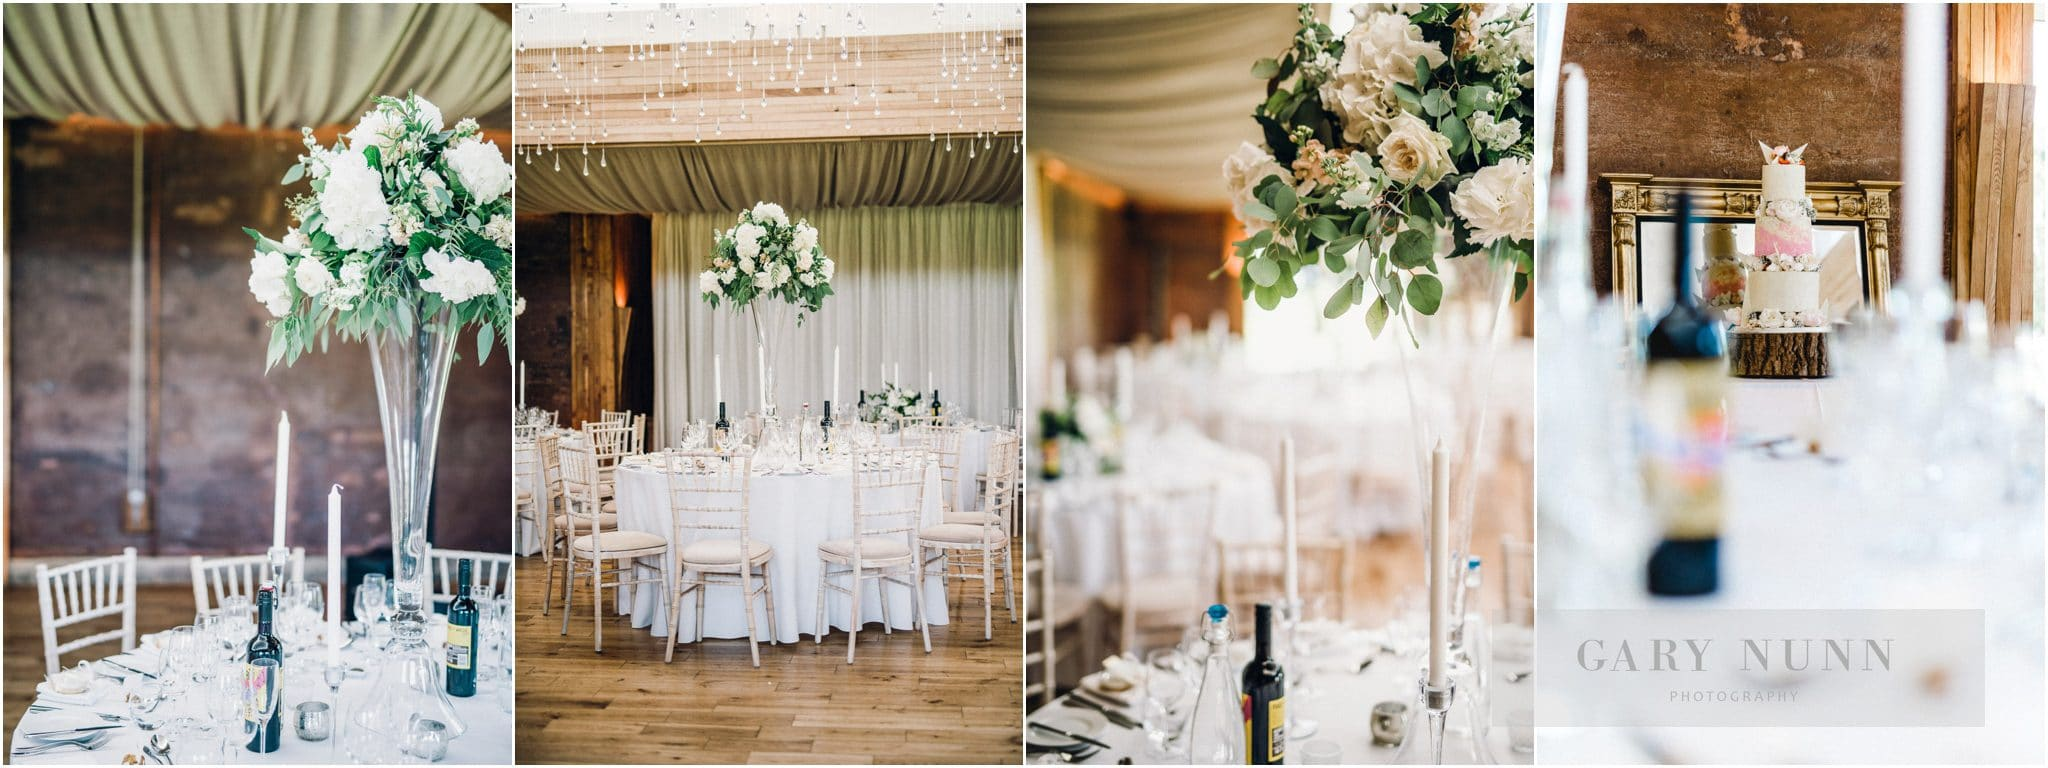 Elmore Court, rammed earth, elmore court weddings, Destination Wedding Photographer, wedding photographer Milton Keynes, Elmore Court